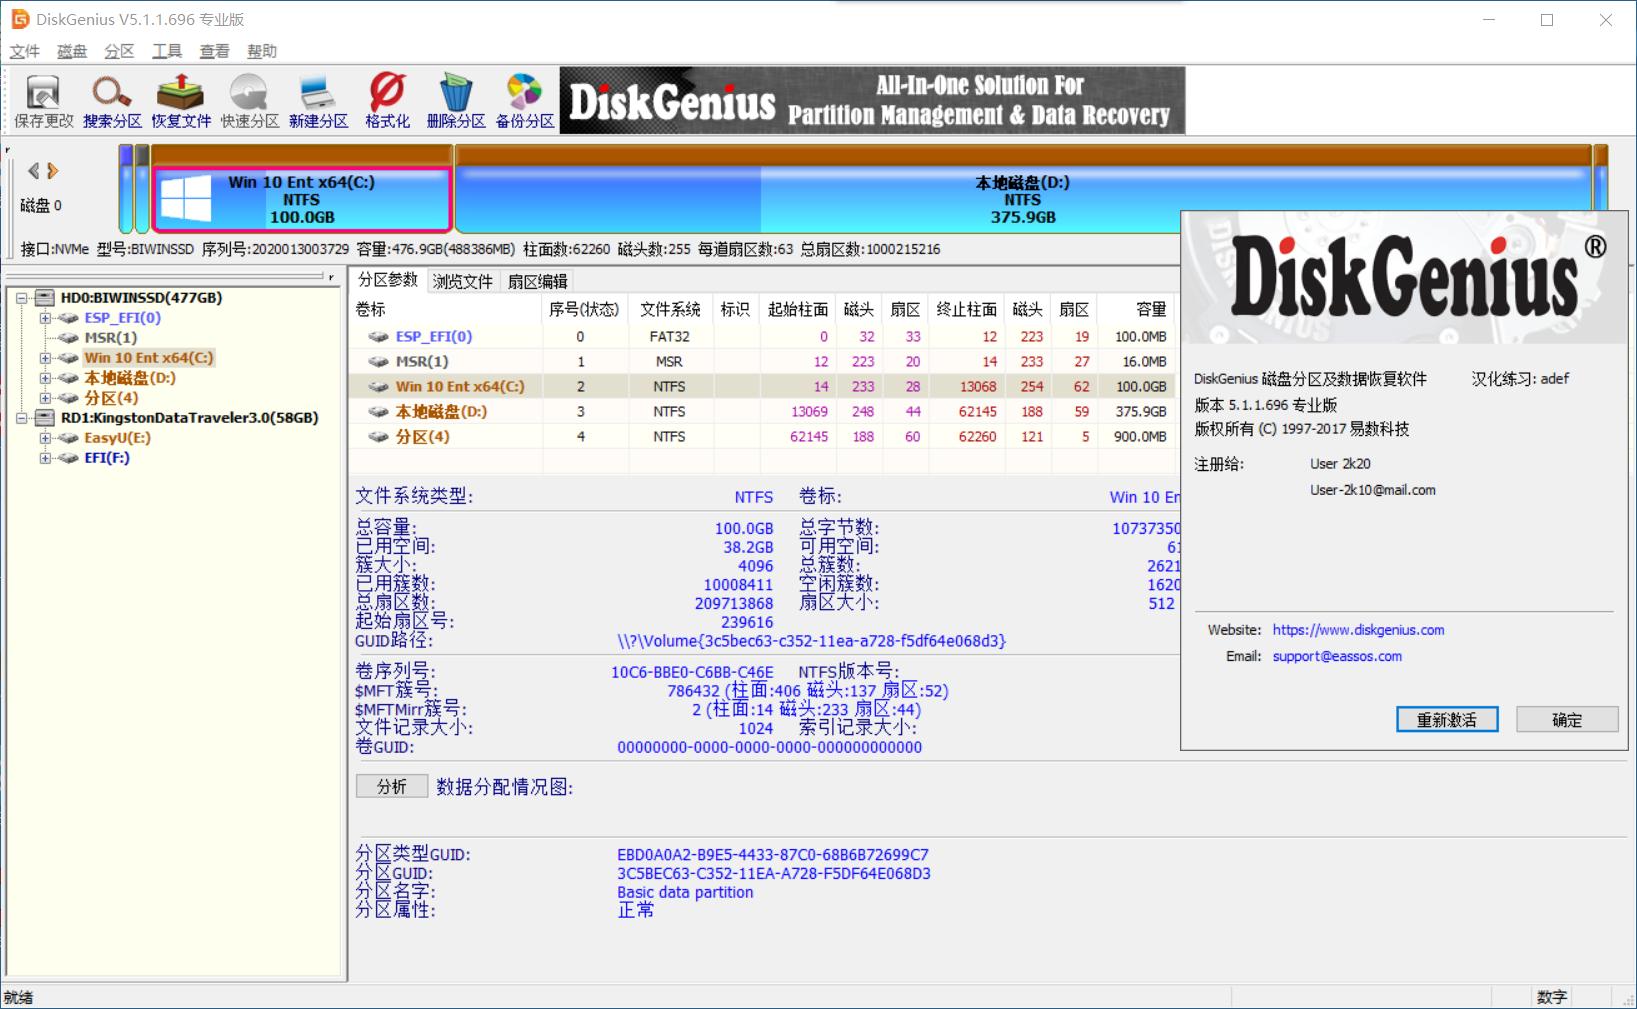 DiskGenius Pro v5.1.1.696 破解永久专业版